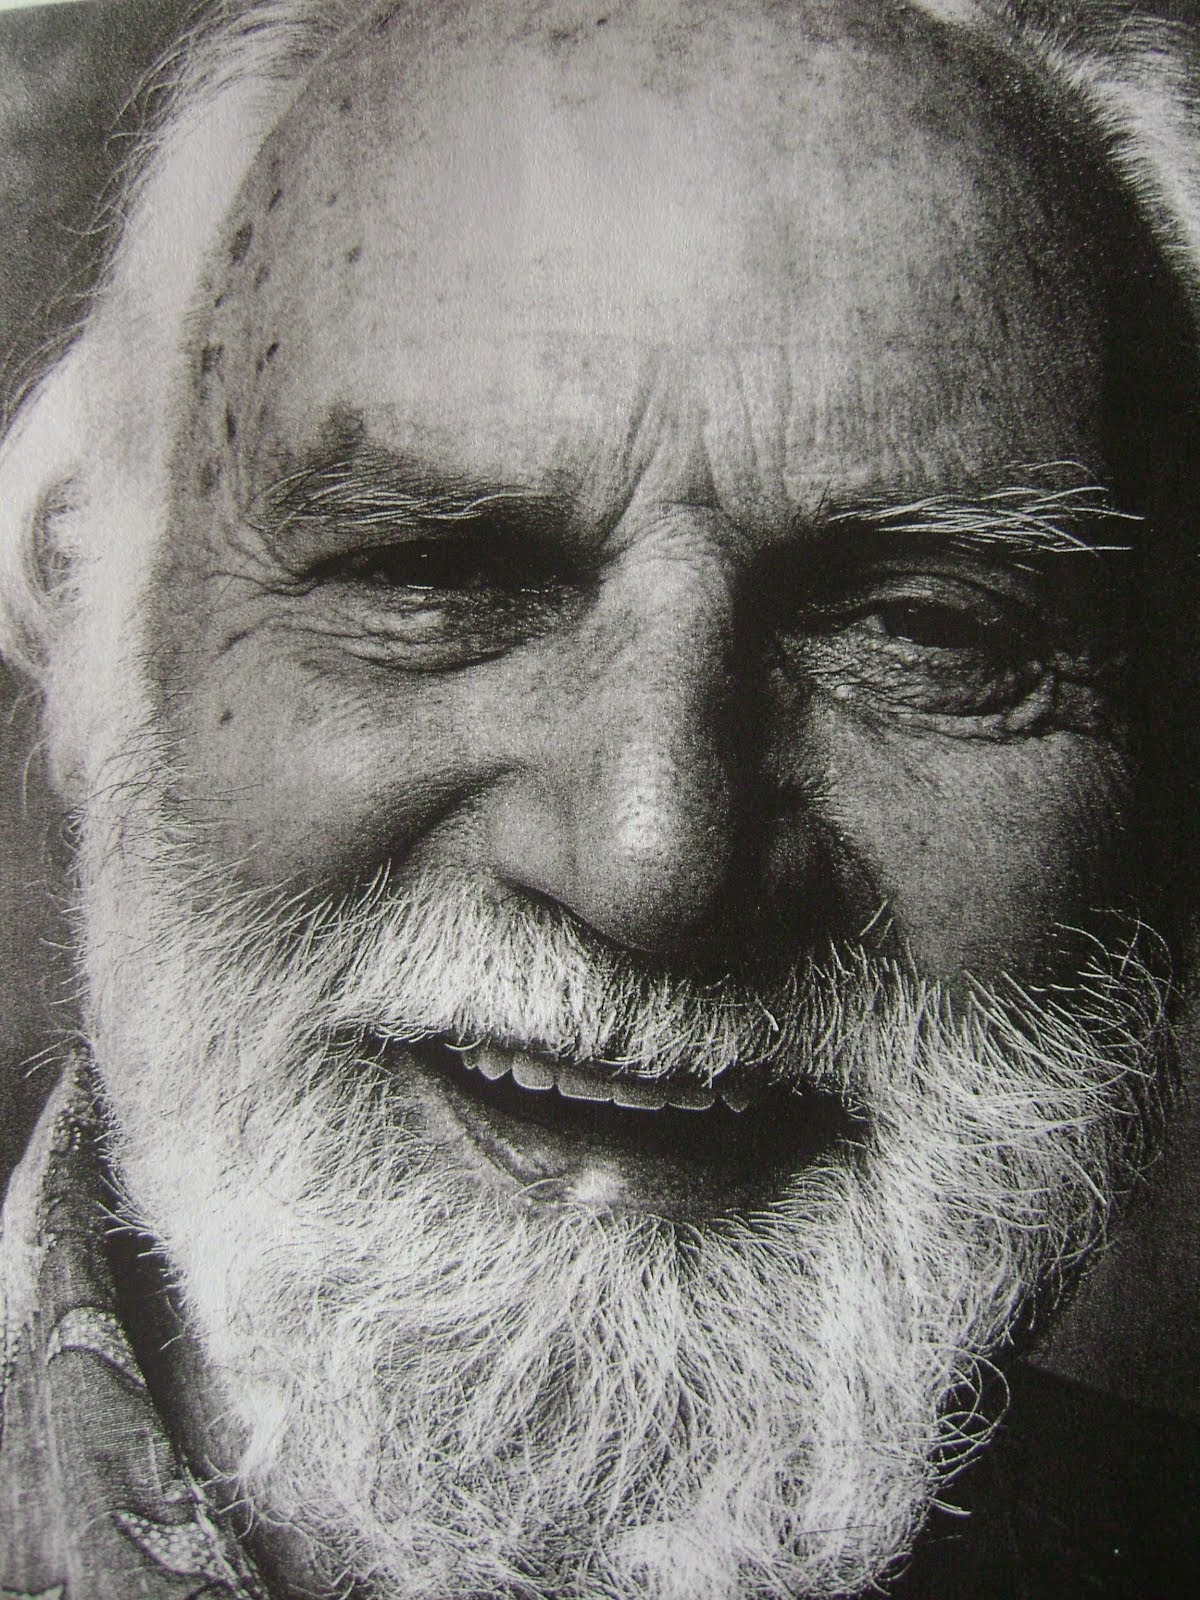 Douglas Harding (1909-2007)